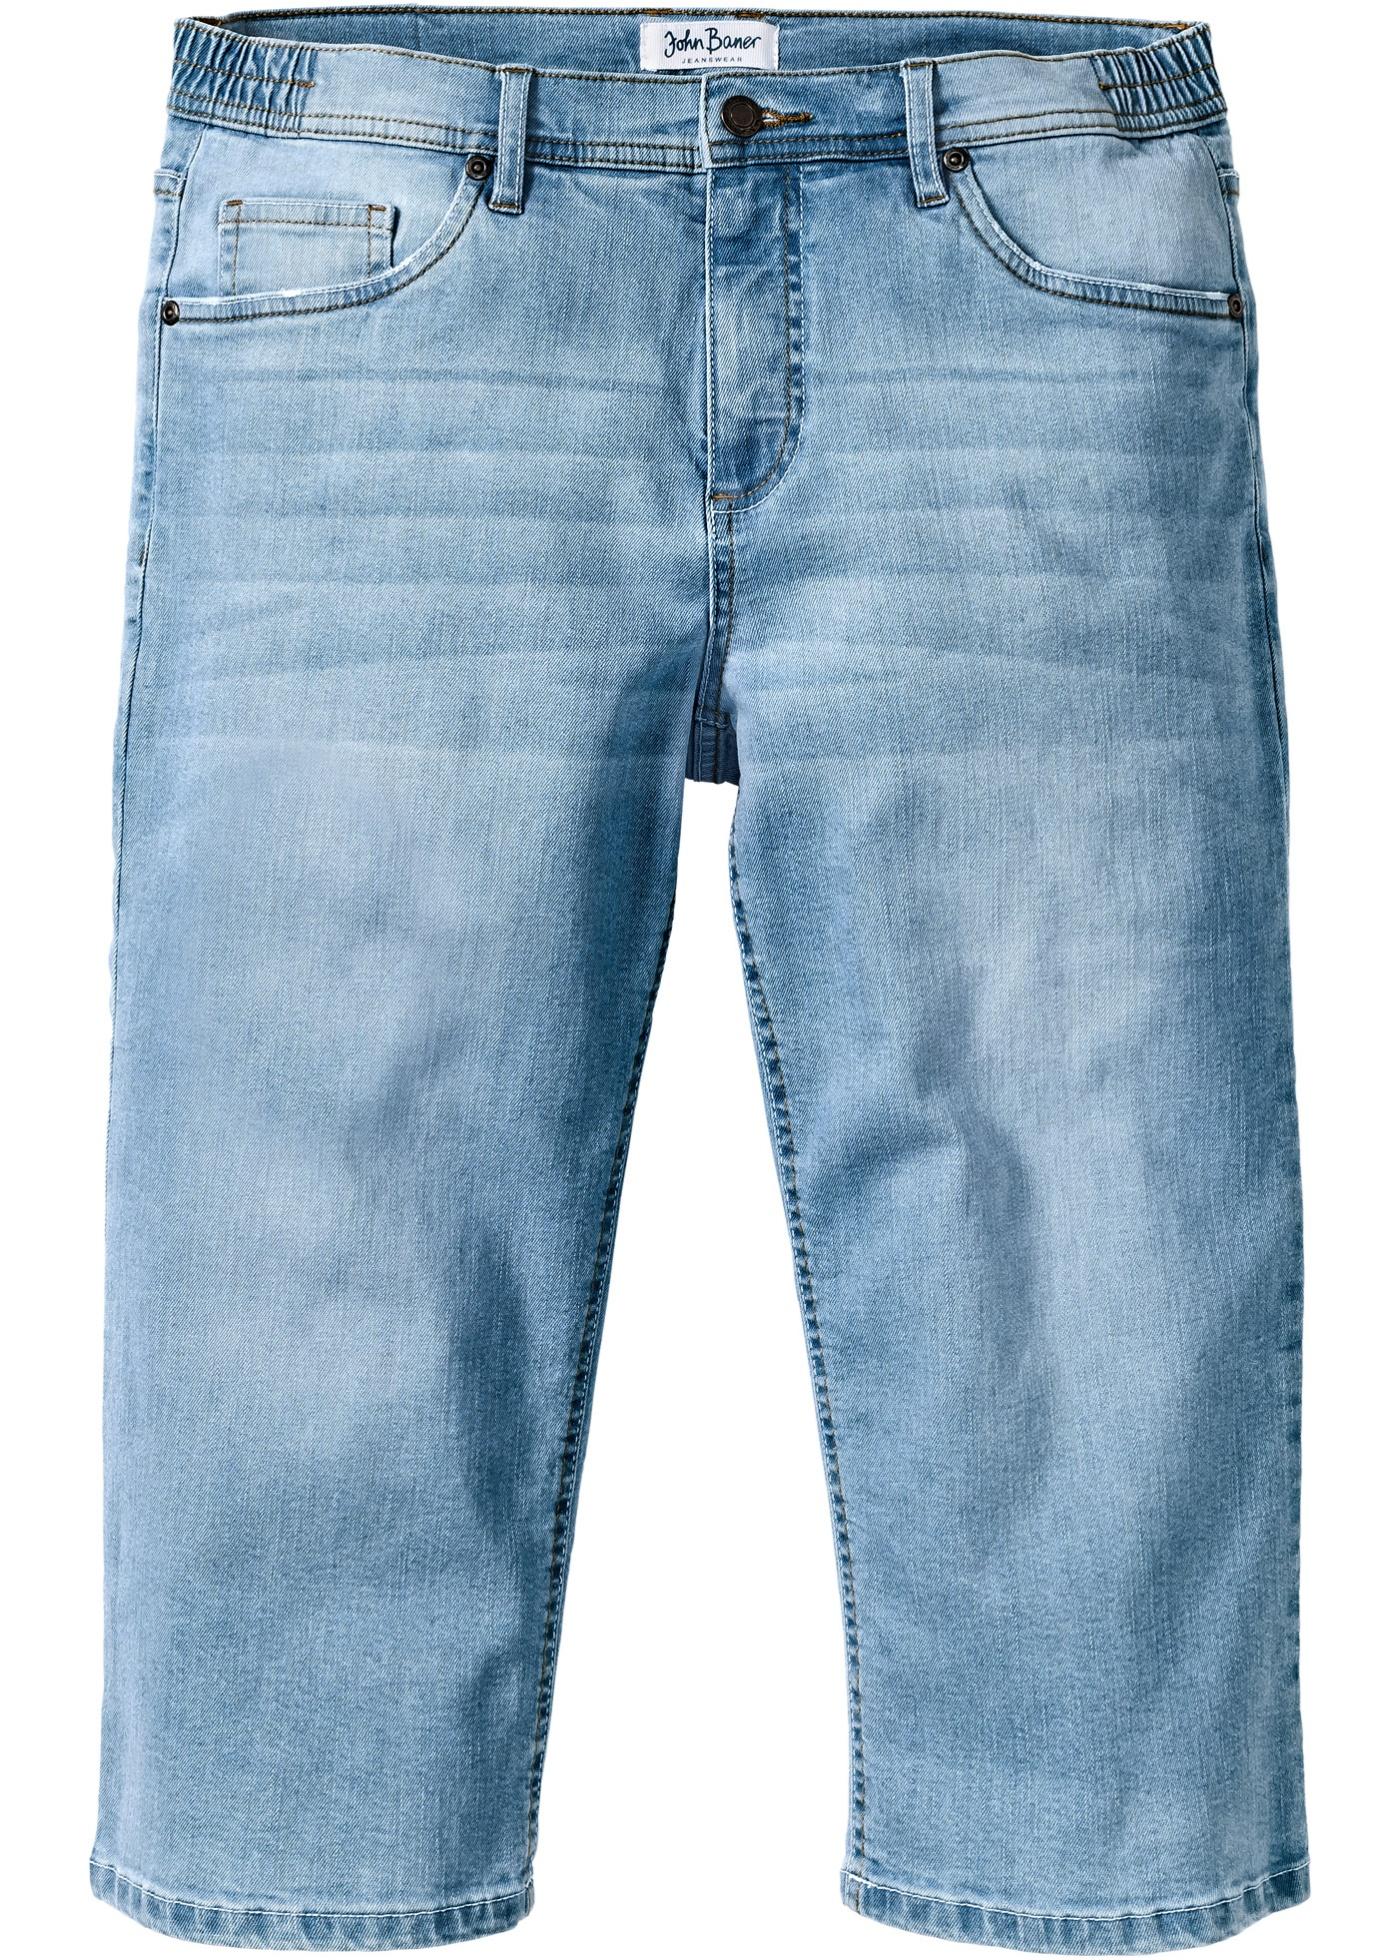 Bonprix - 3/4 jeans 249.00